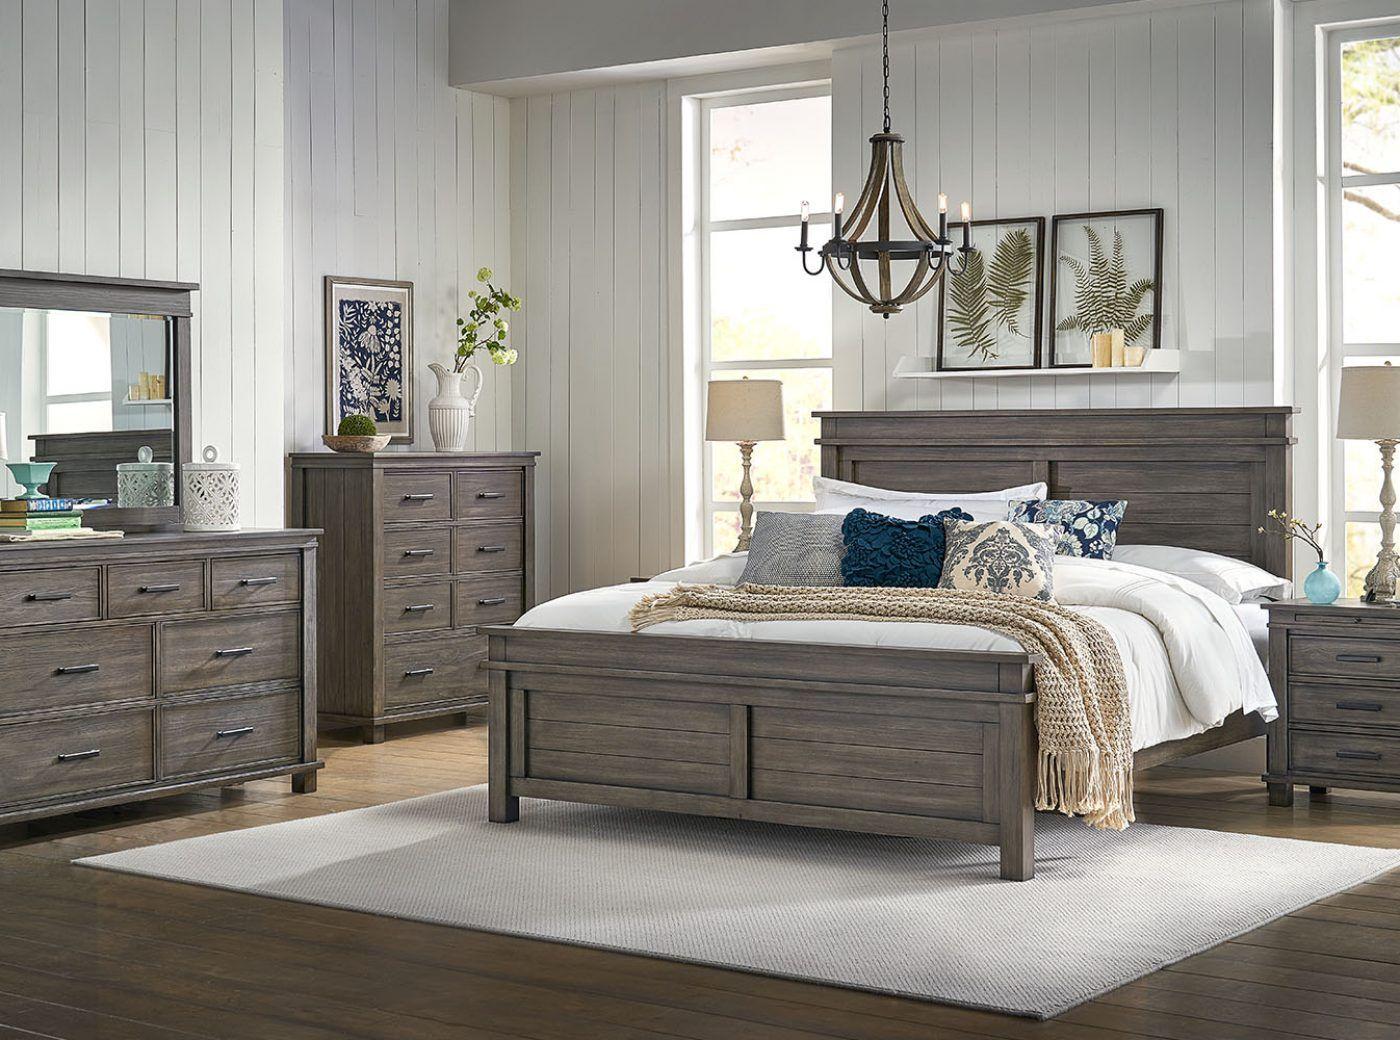 Glacier Point Bedroom design on a budget, Luxury bedroom